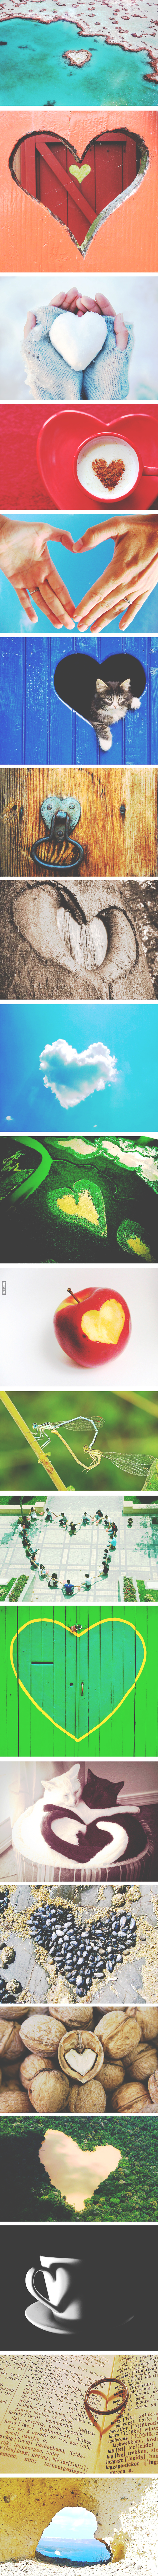 heartUC2.jpg